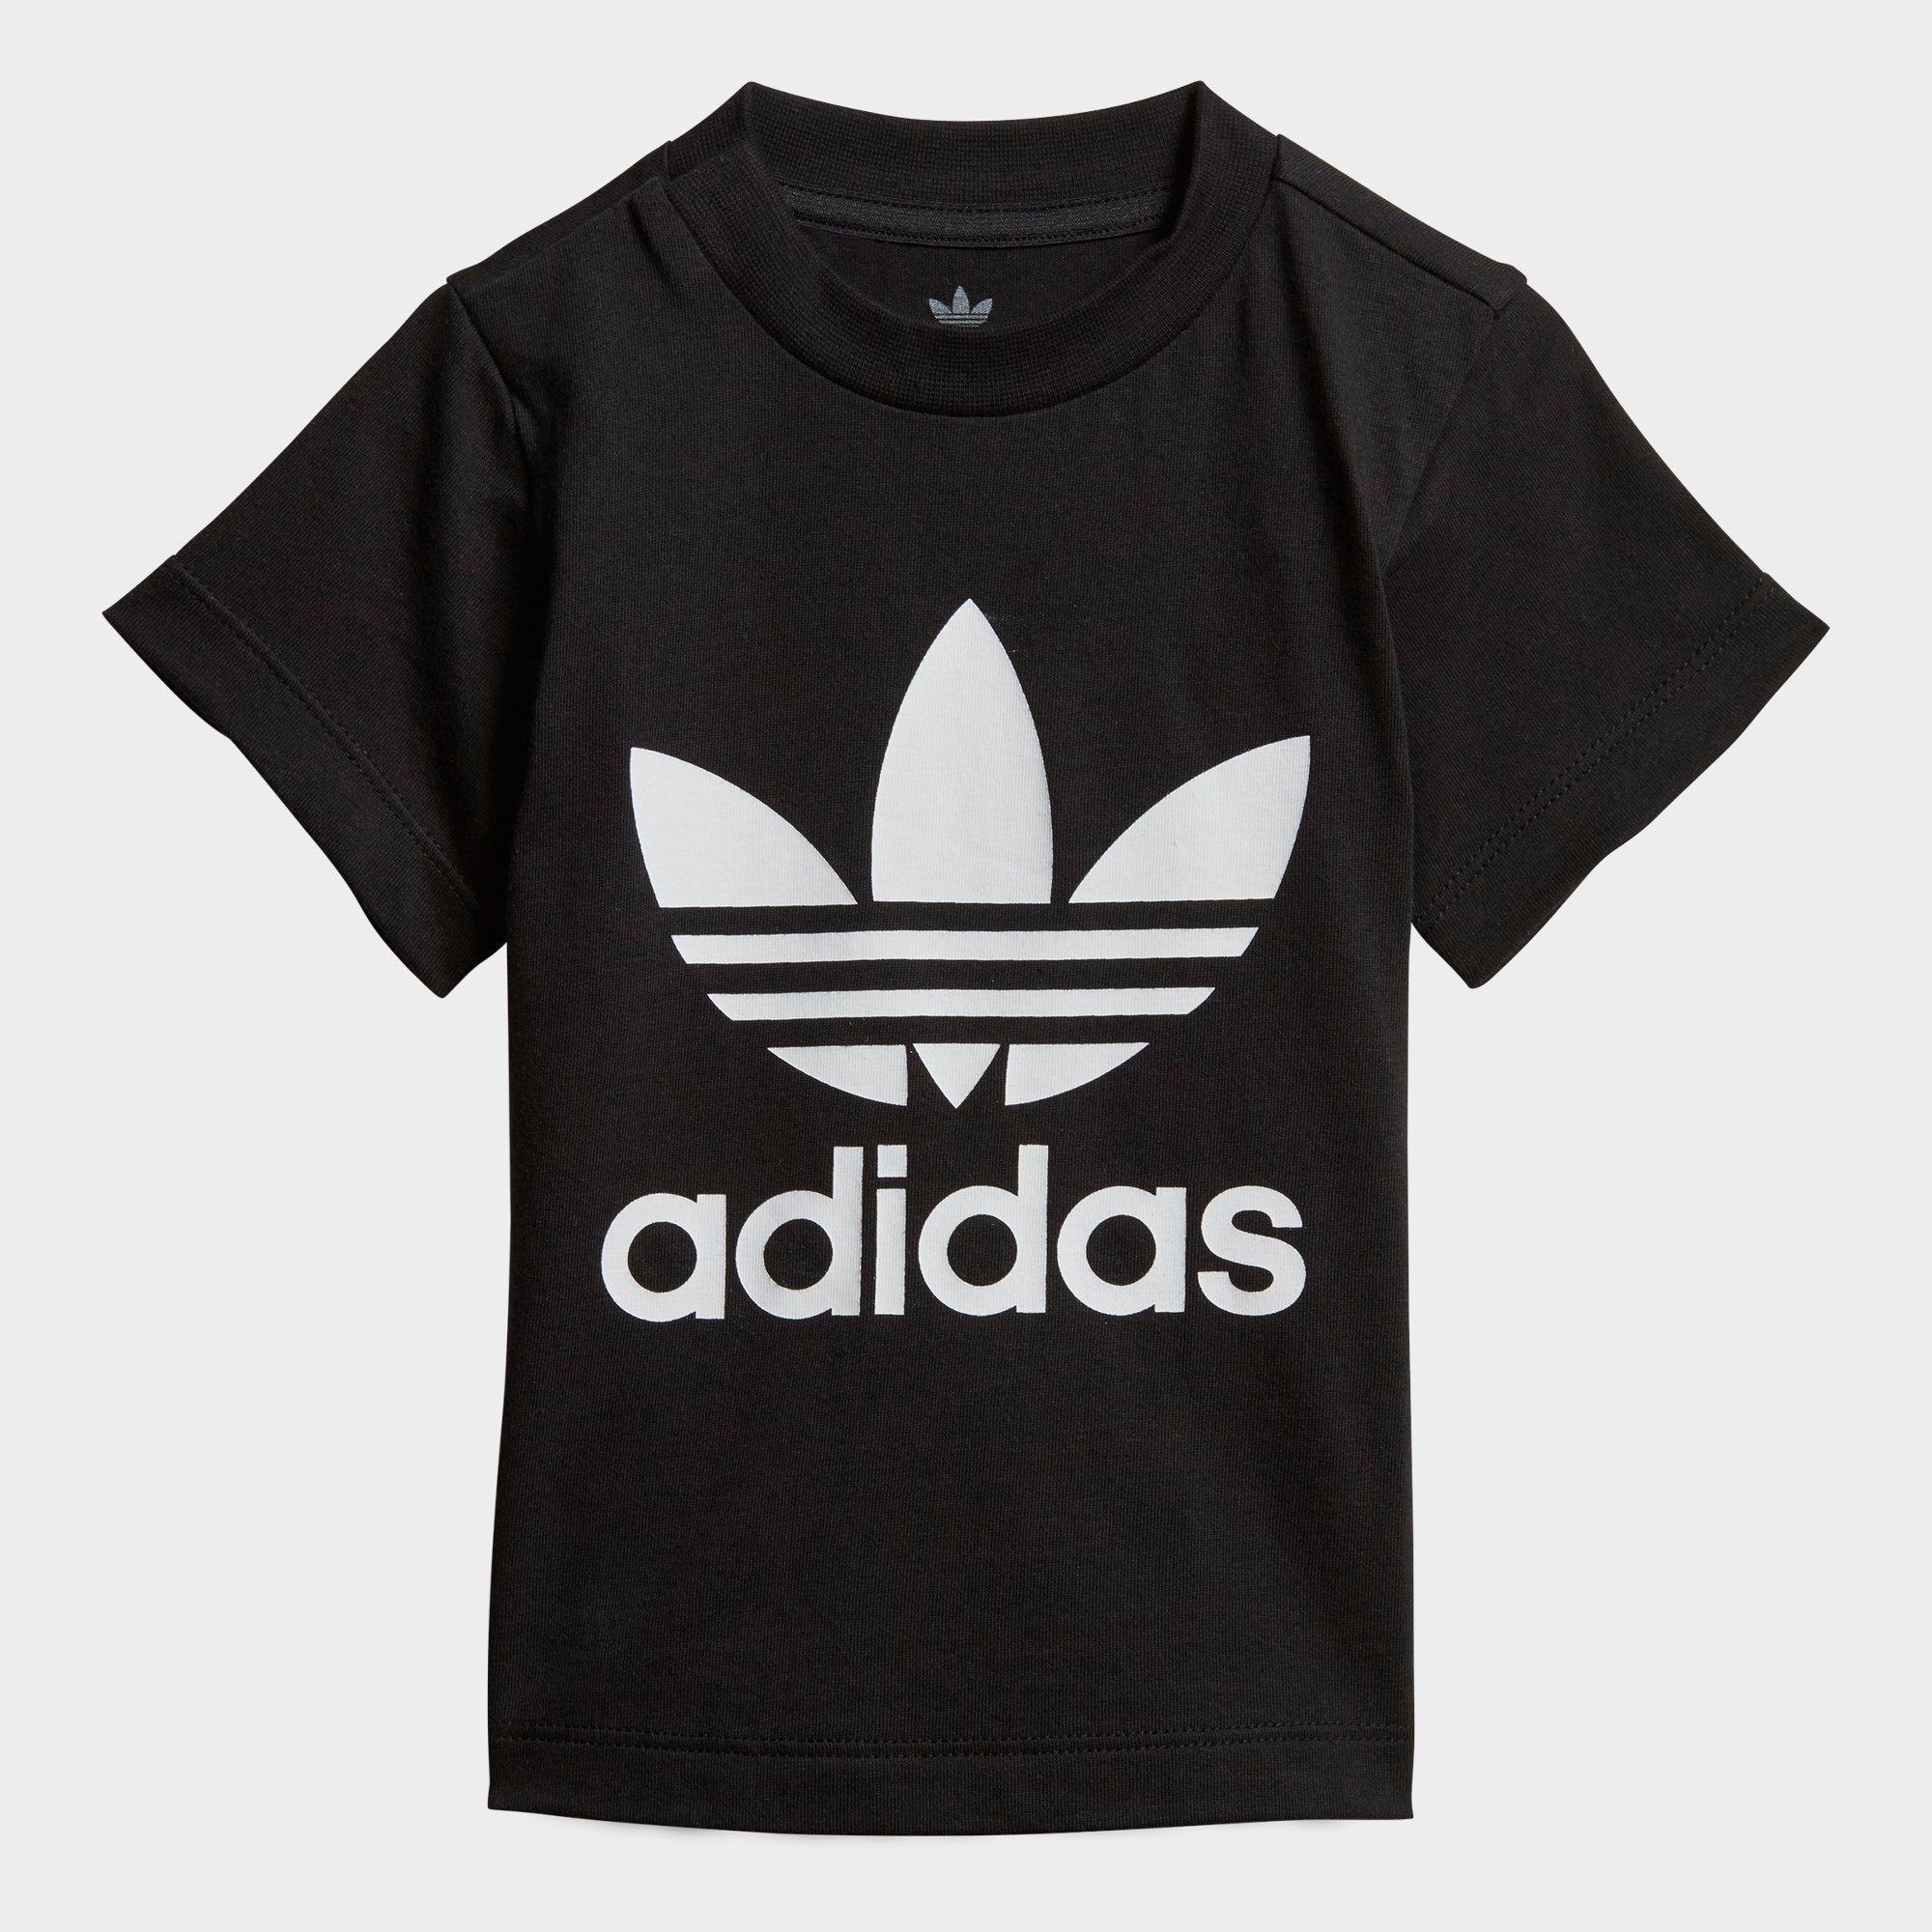 adidas t shirt kids